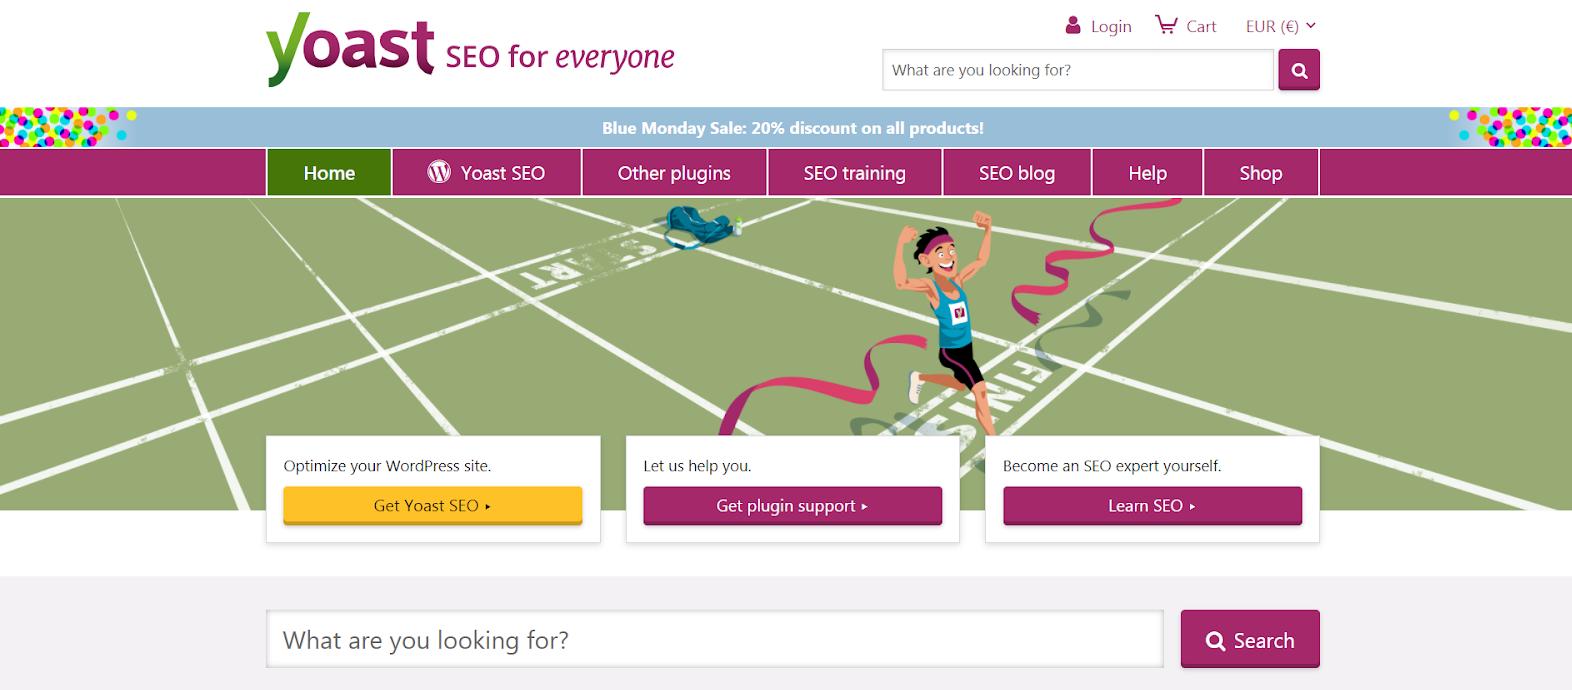 Yoast SEO website